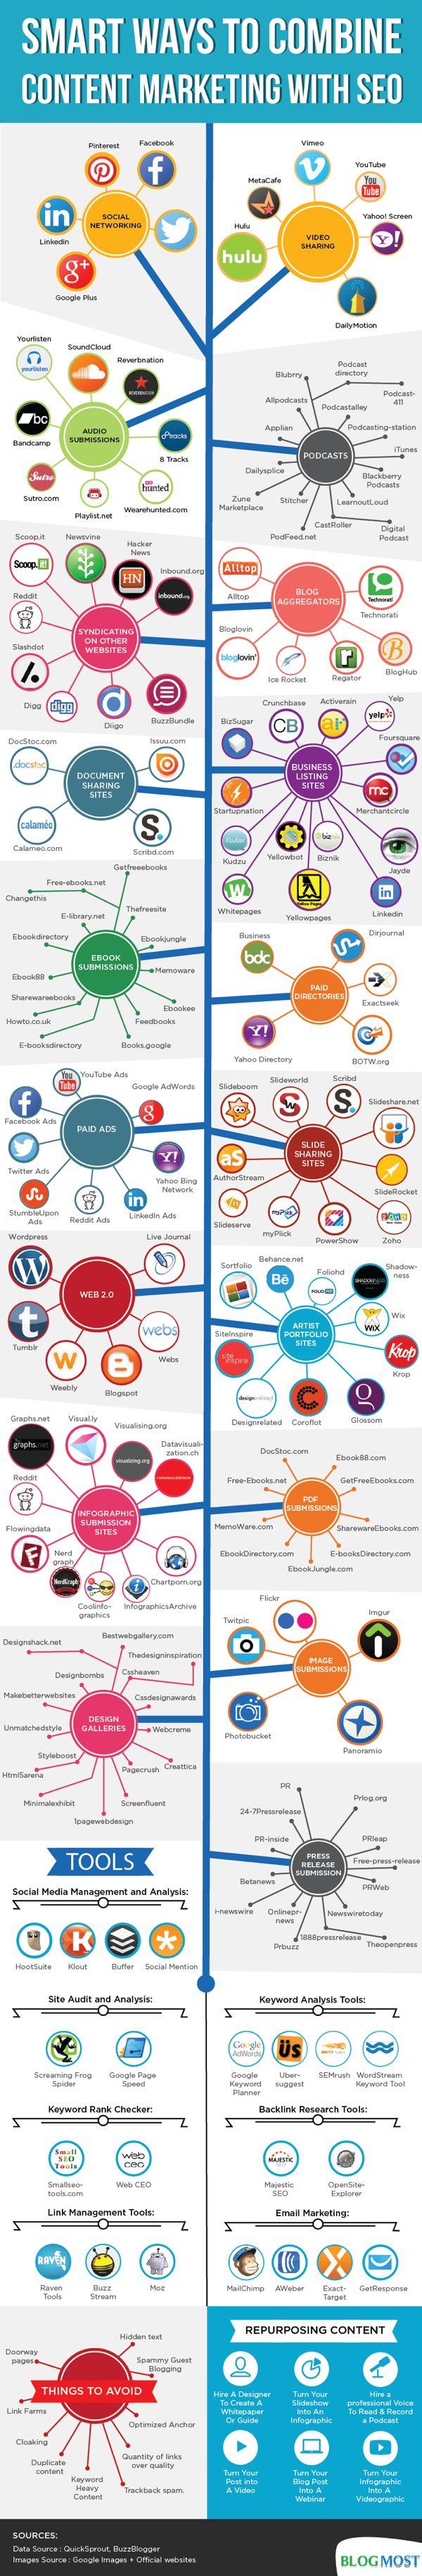 Het grote Contentmarketing/SEO overzicht - TomorrowMobile